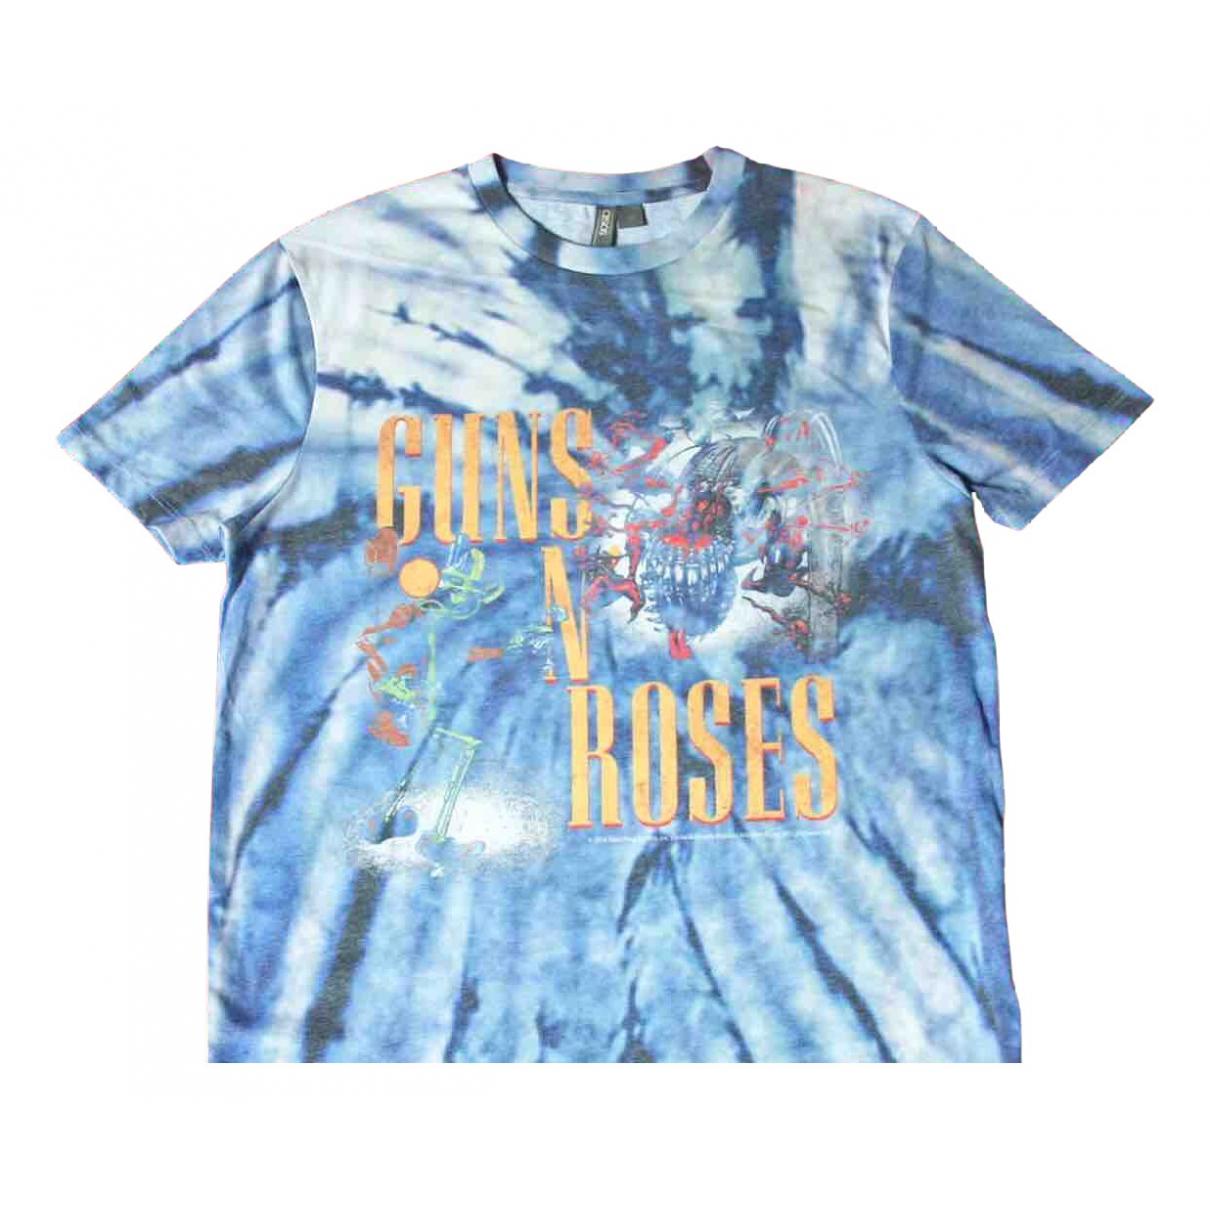 Asos - Tee shirts   pour homme - bleu